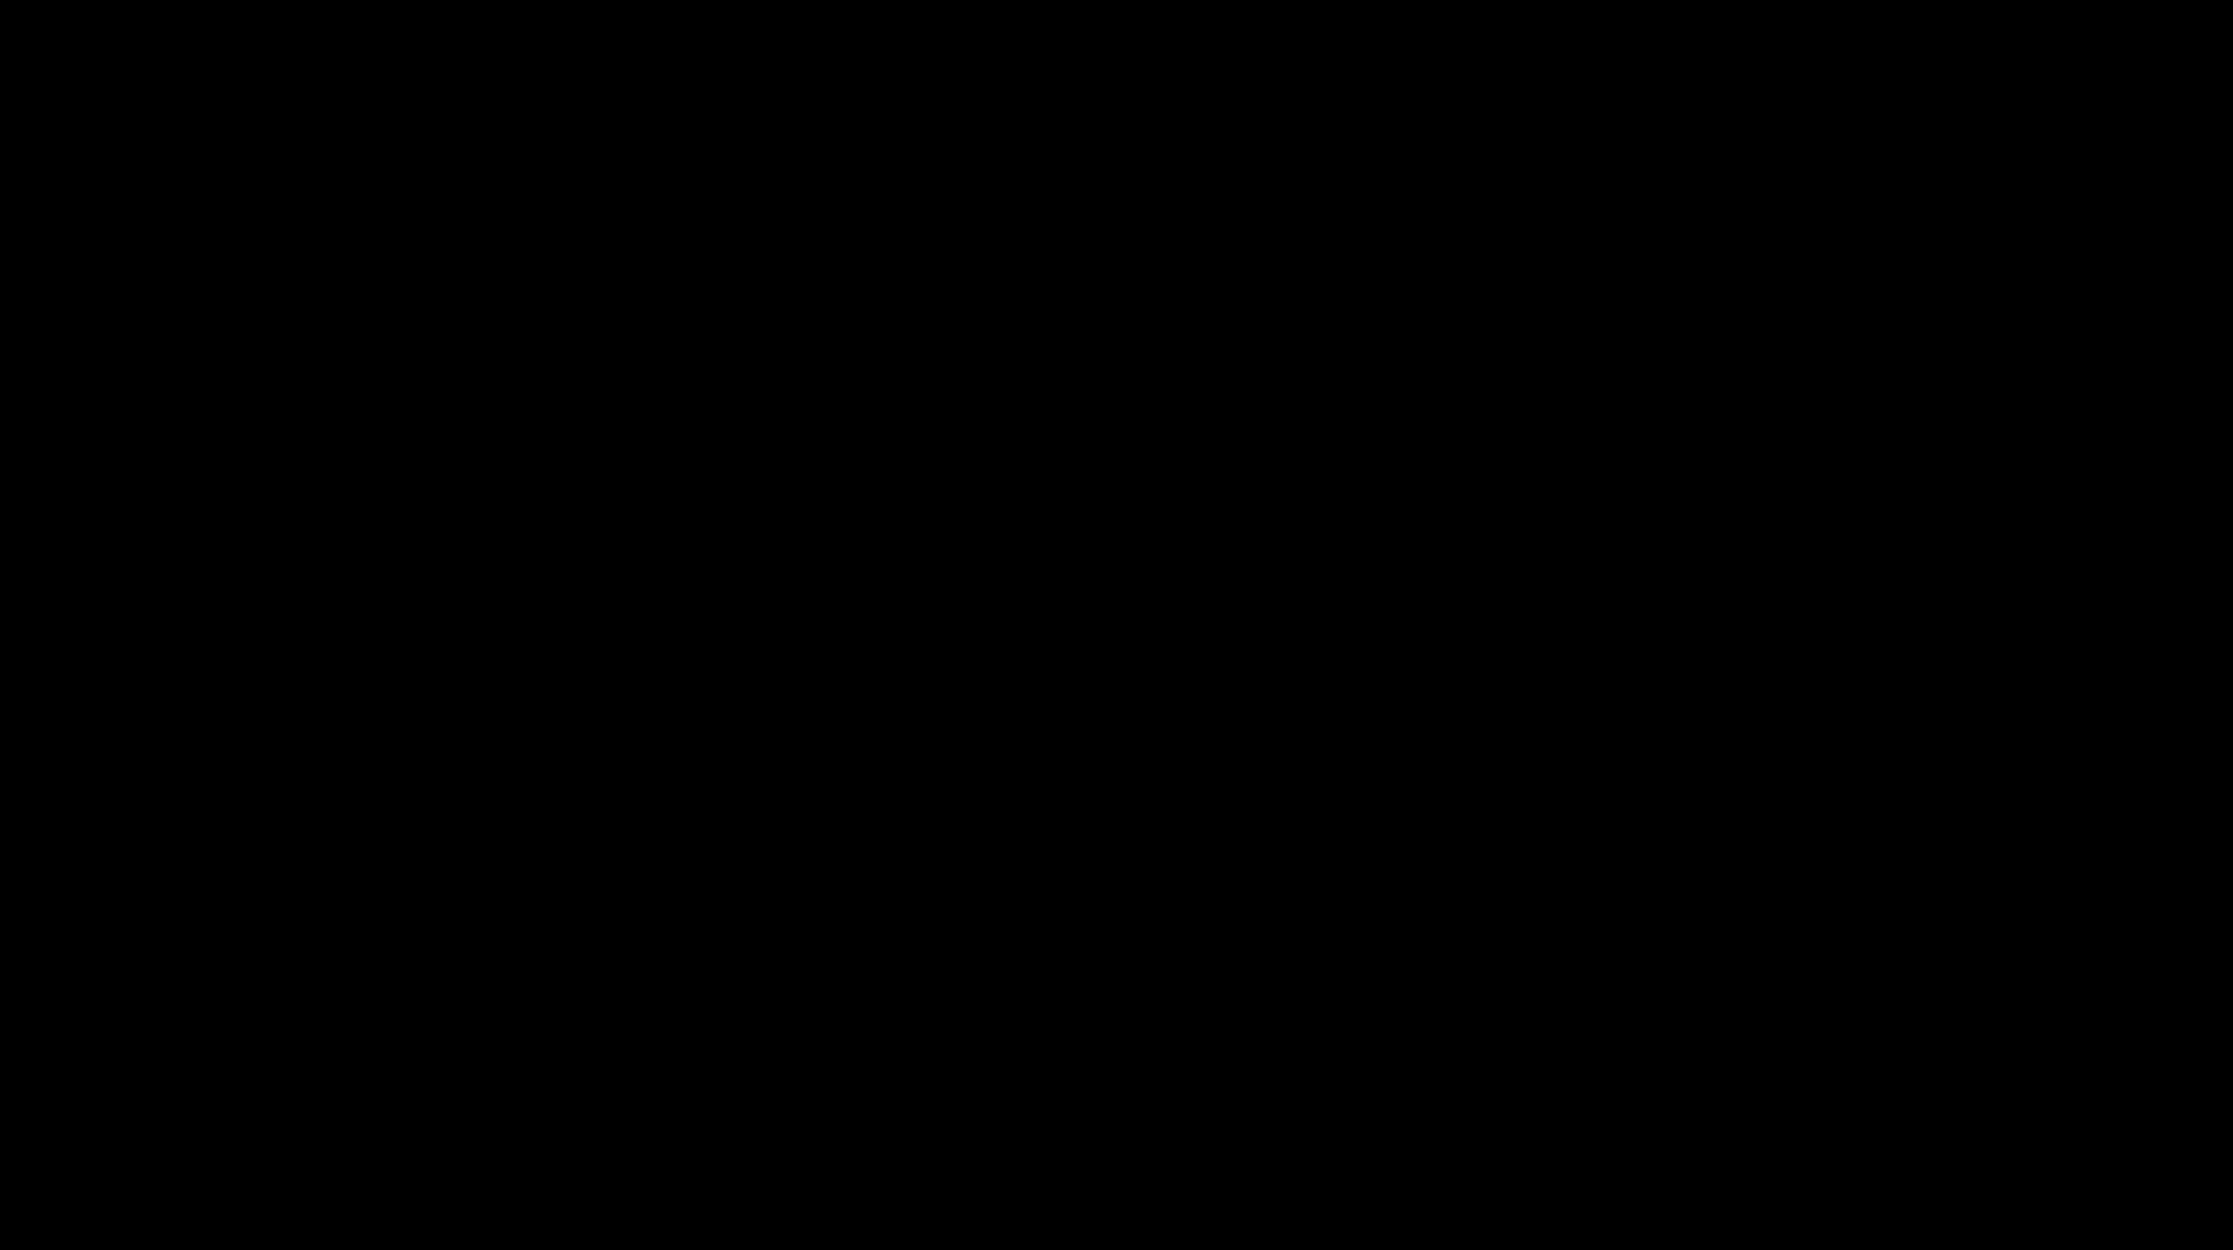 Blackfin BF743 WATERHOUSE